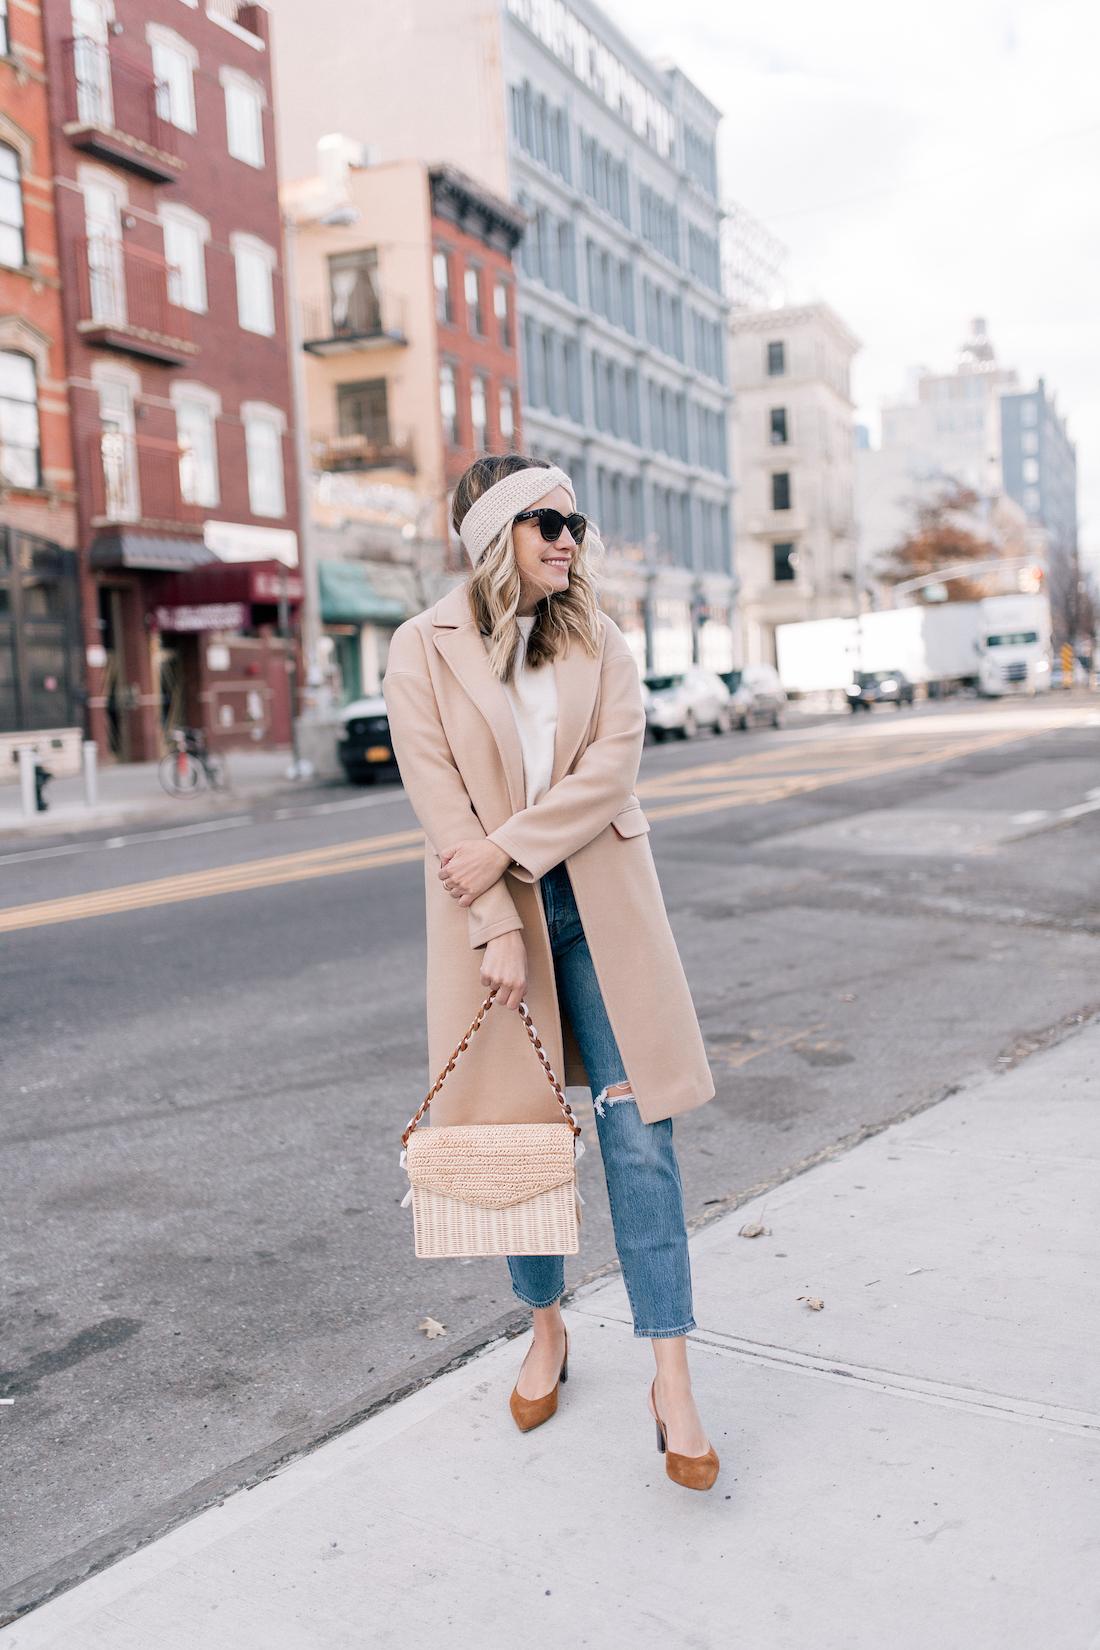 Grace Outfit Details:Topshop Coat(exact) // Eileen Fisher Sweater(c/o) // Eileen Fisher Headband (c/o)// Levi's Jeans // Polaroid Sunglasses // Pamela Munson Bag (c/o) // Sarah Flint Heels // J.Crew Belt